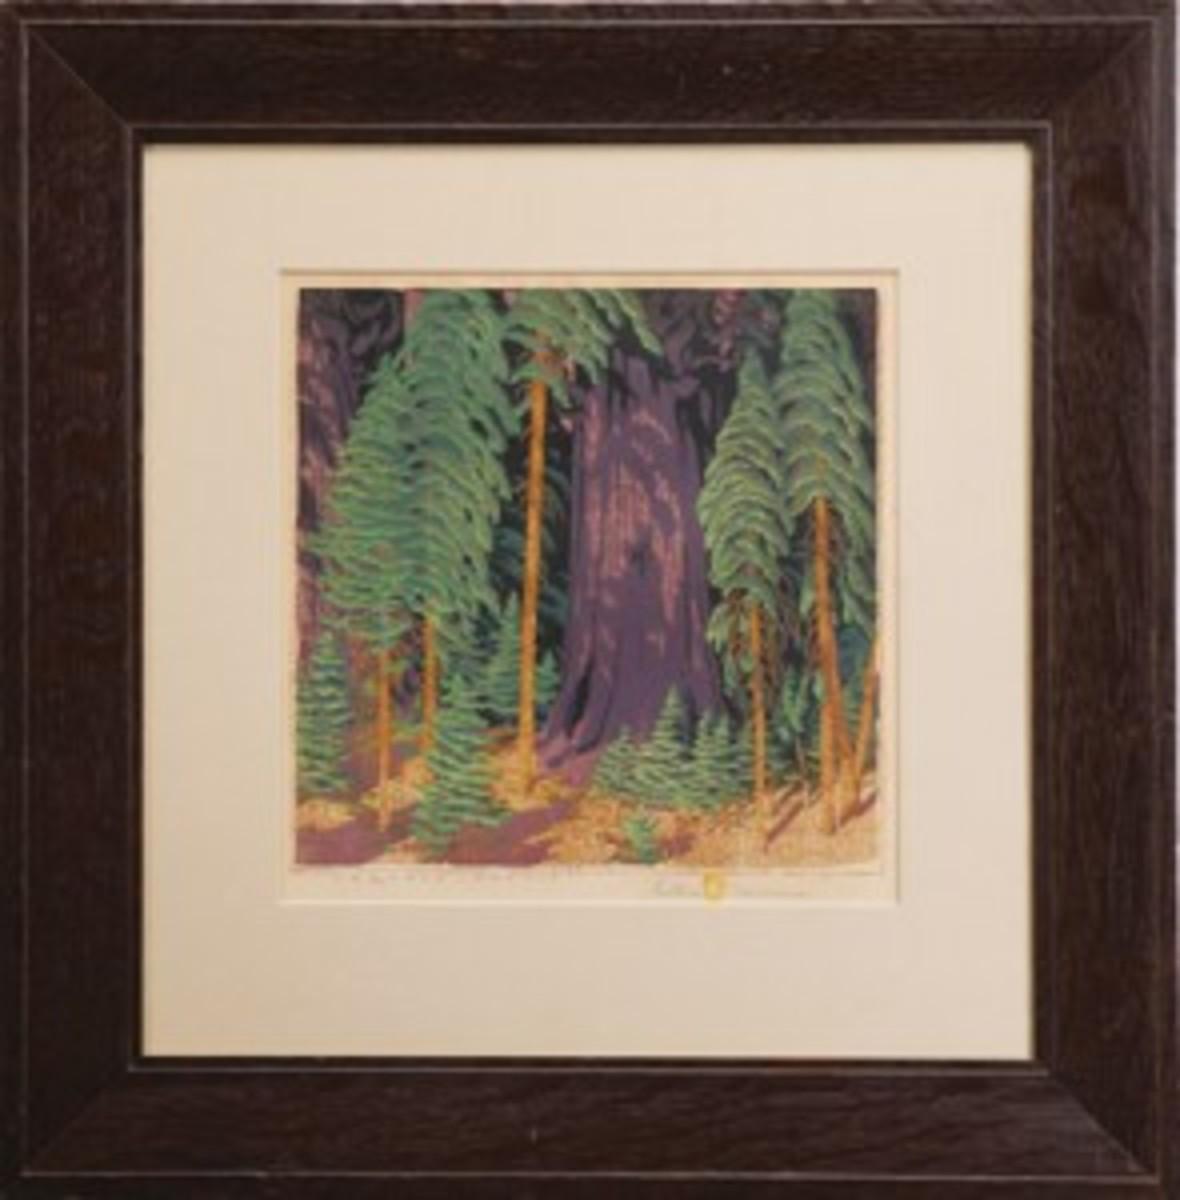 Baumann wood block print